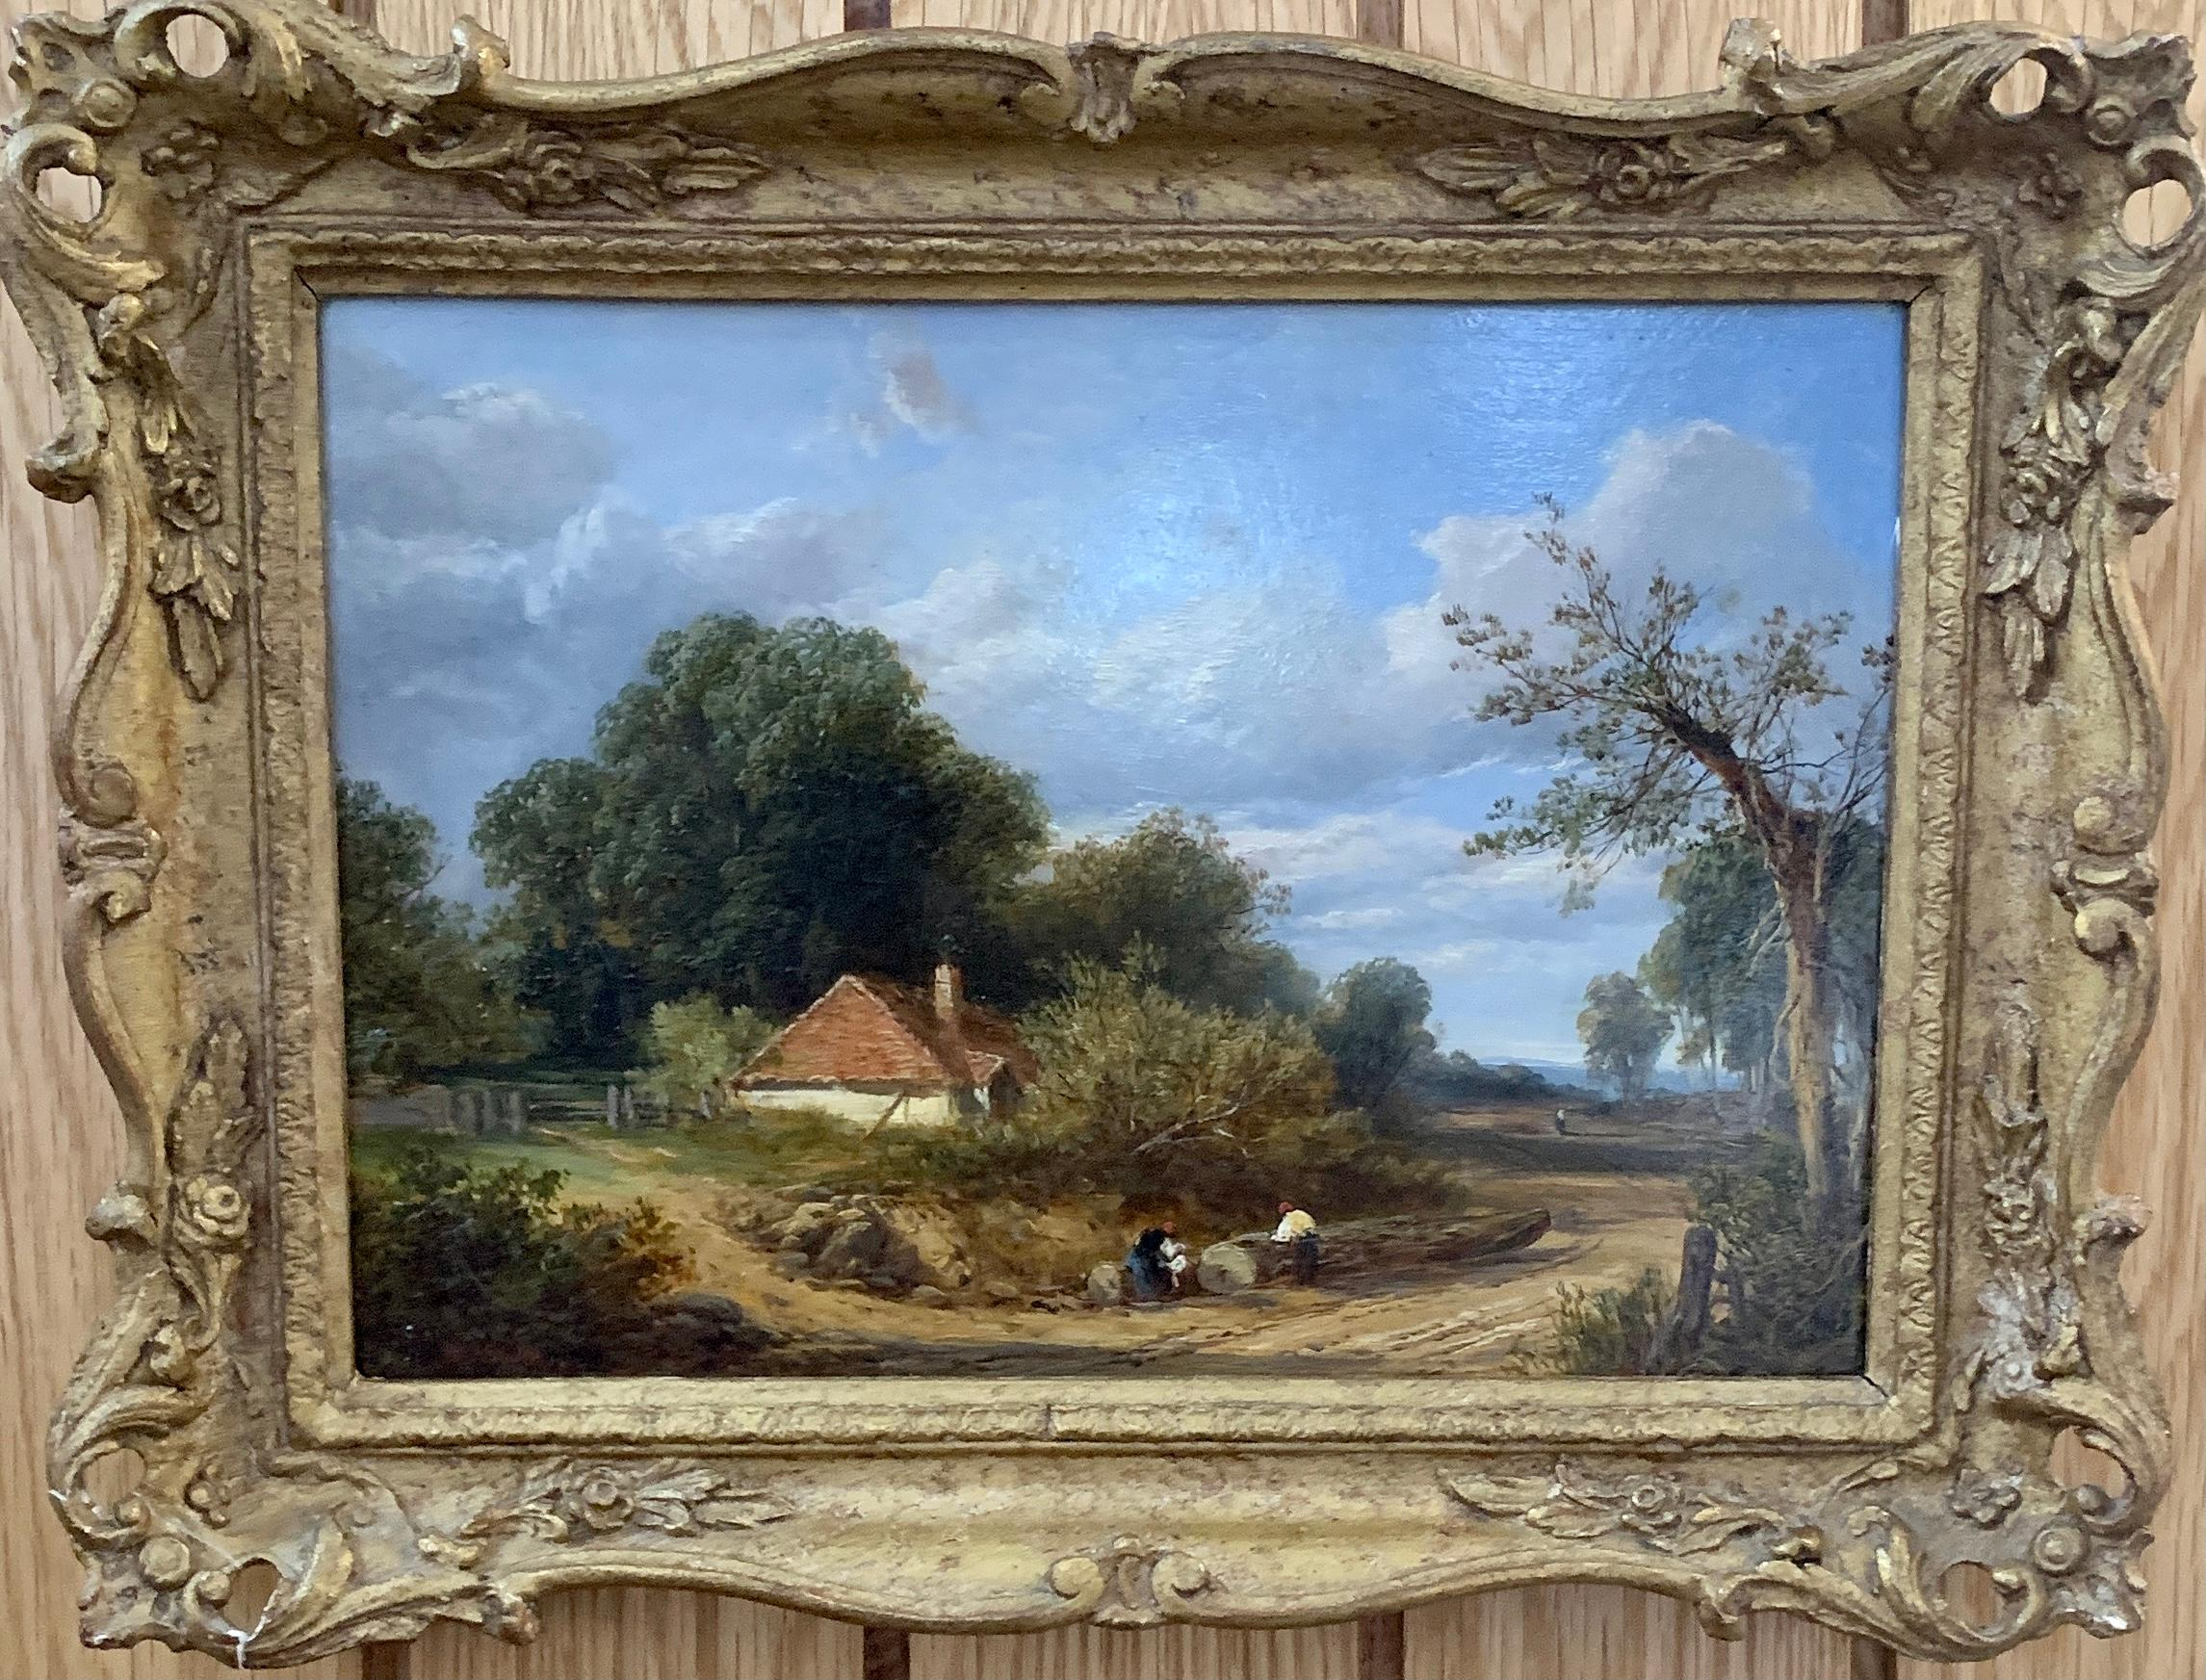 Landscape, English Victorian Cottage landscape with figures on a path, oak trees